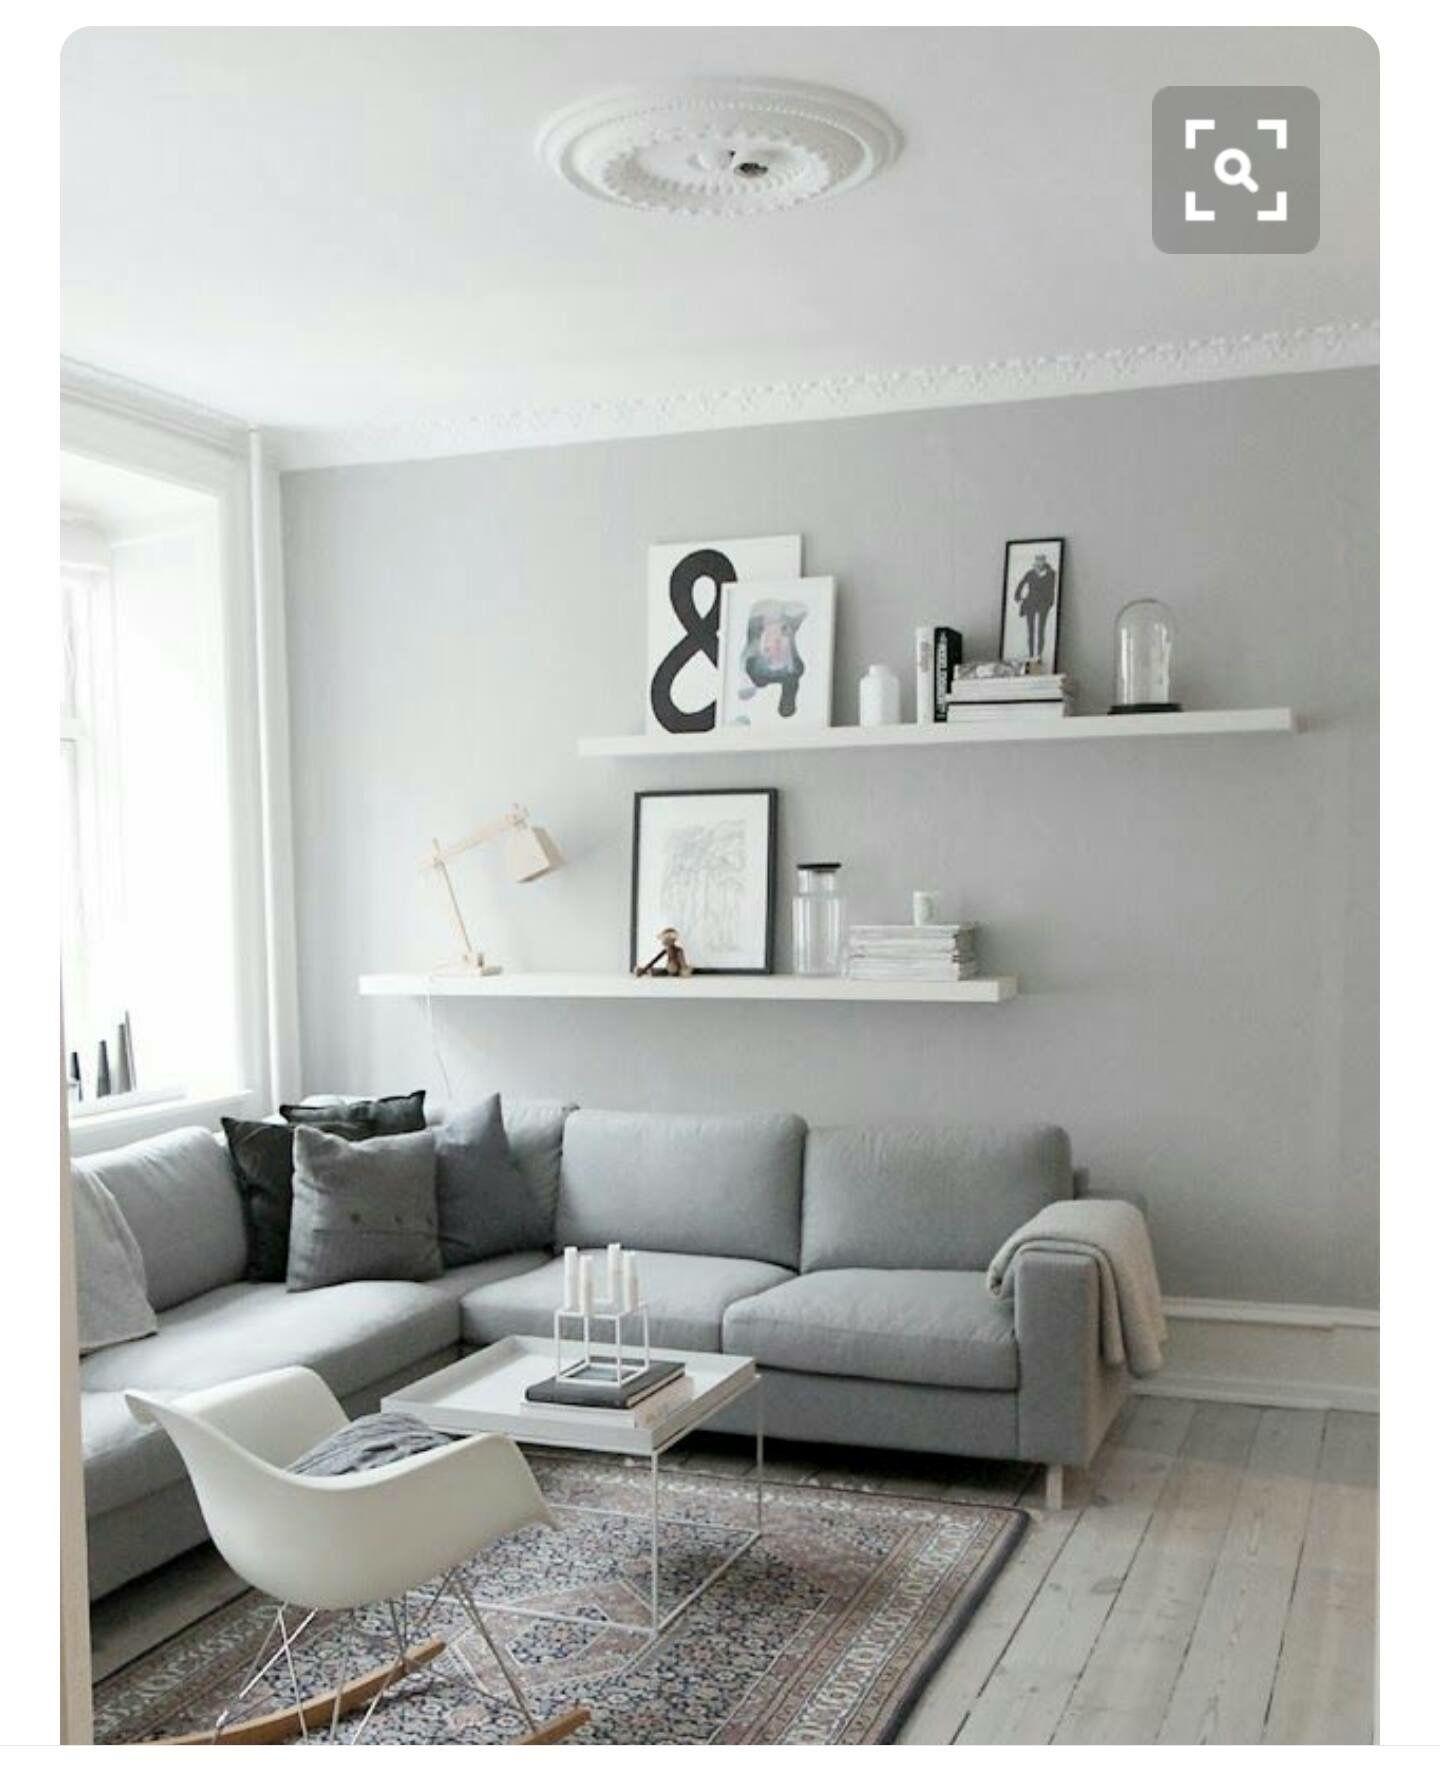 Grey, simple, scandi living area | Bedroom decorating ideas ...